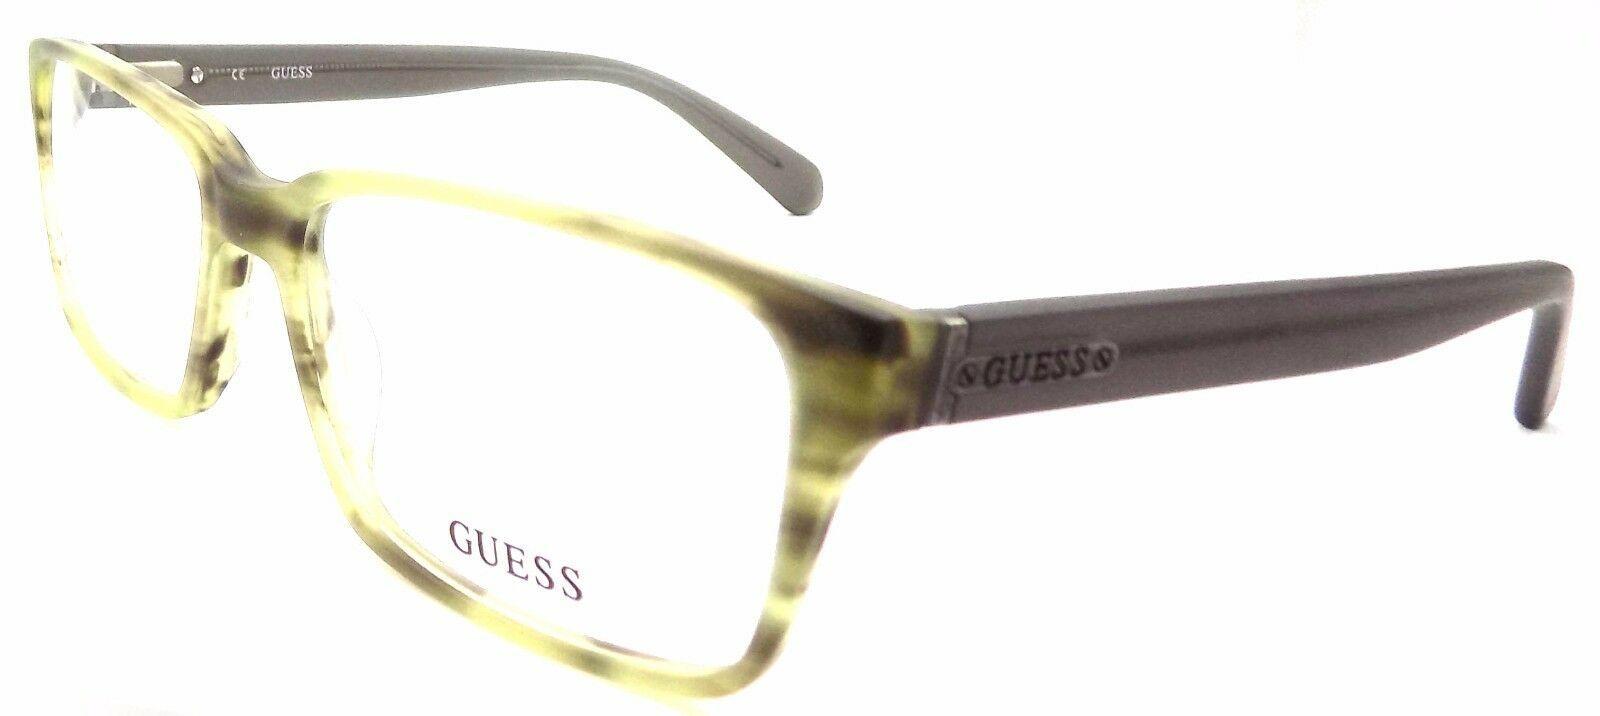 GUESS GU1843 GRN Men's Eyeglasses Frames 55-17-145 Matte Green + Case